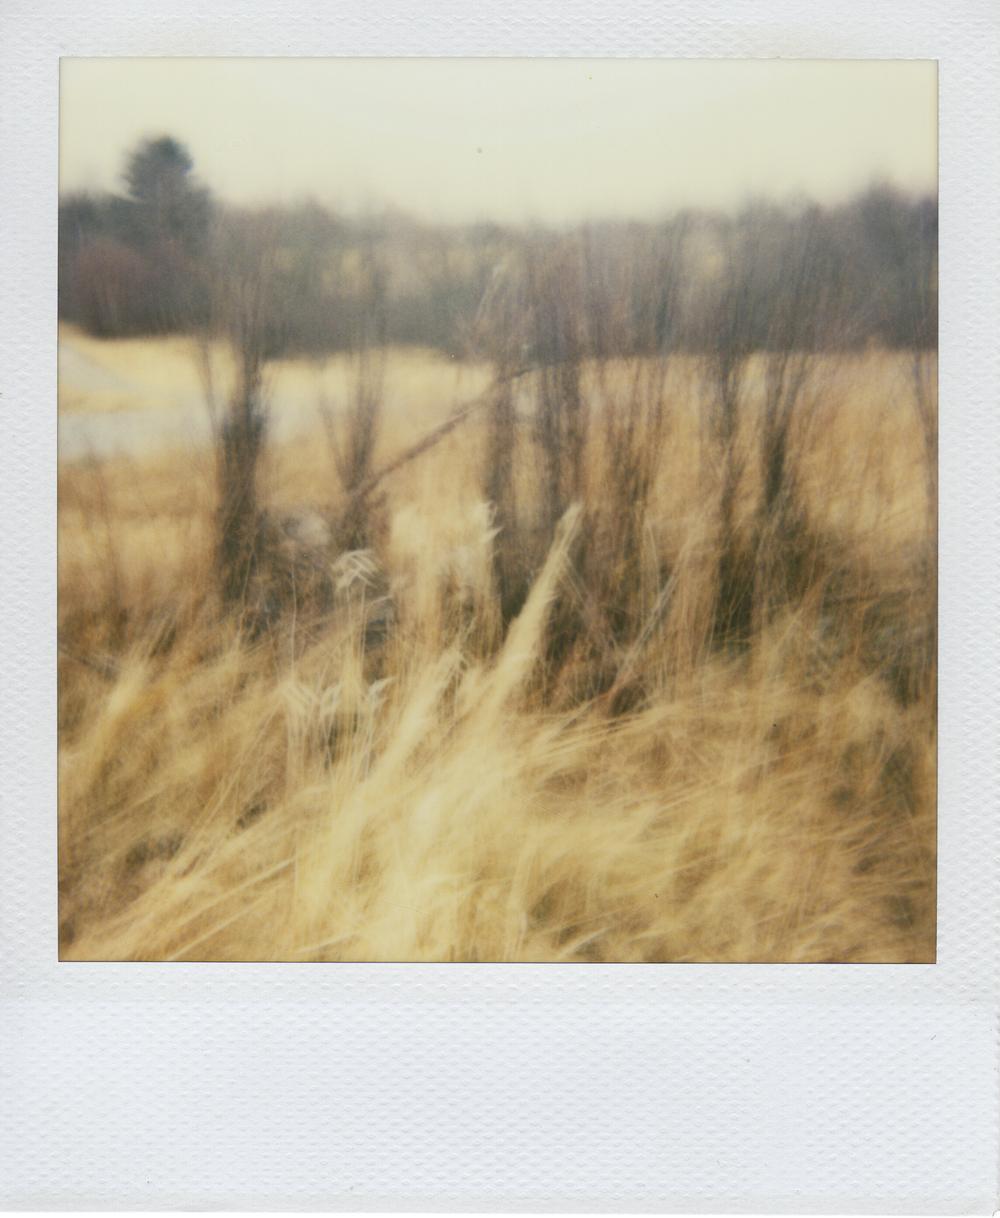 jlaurence-polaroid-089.jpg